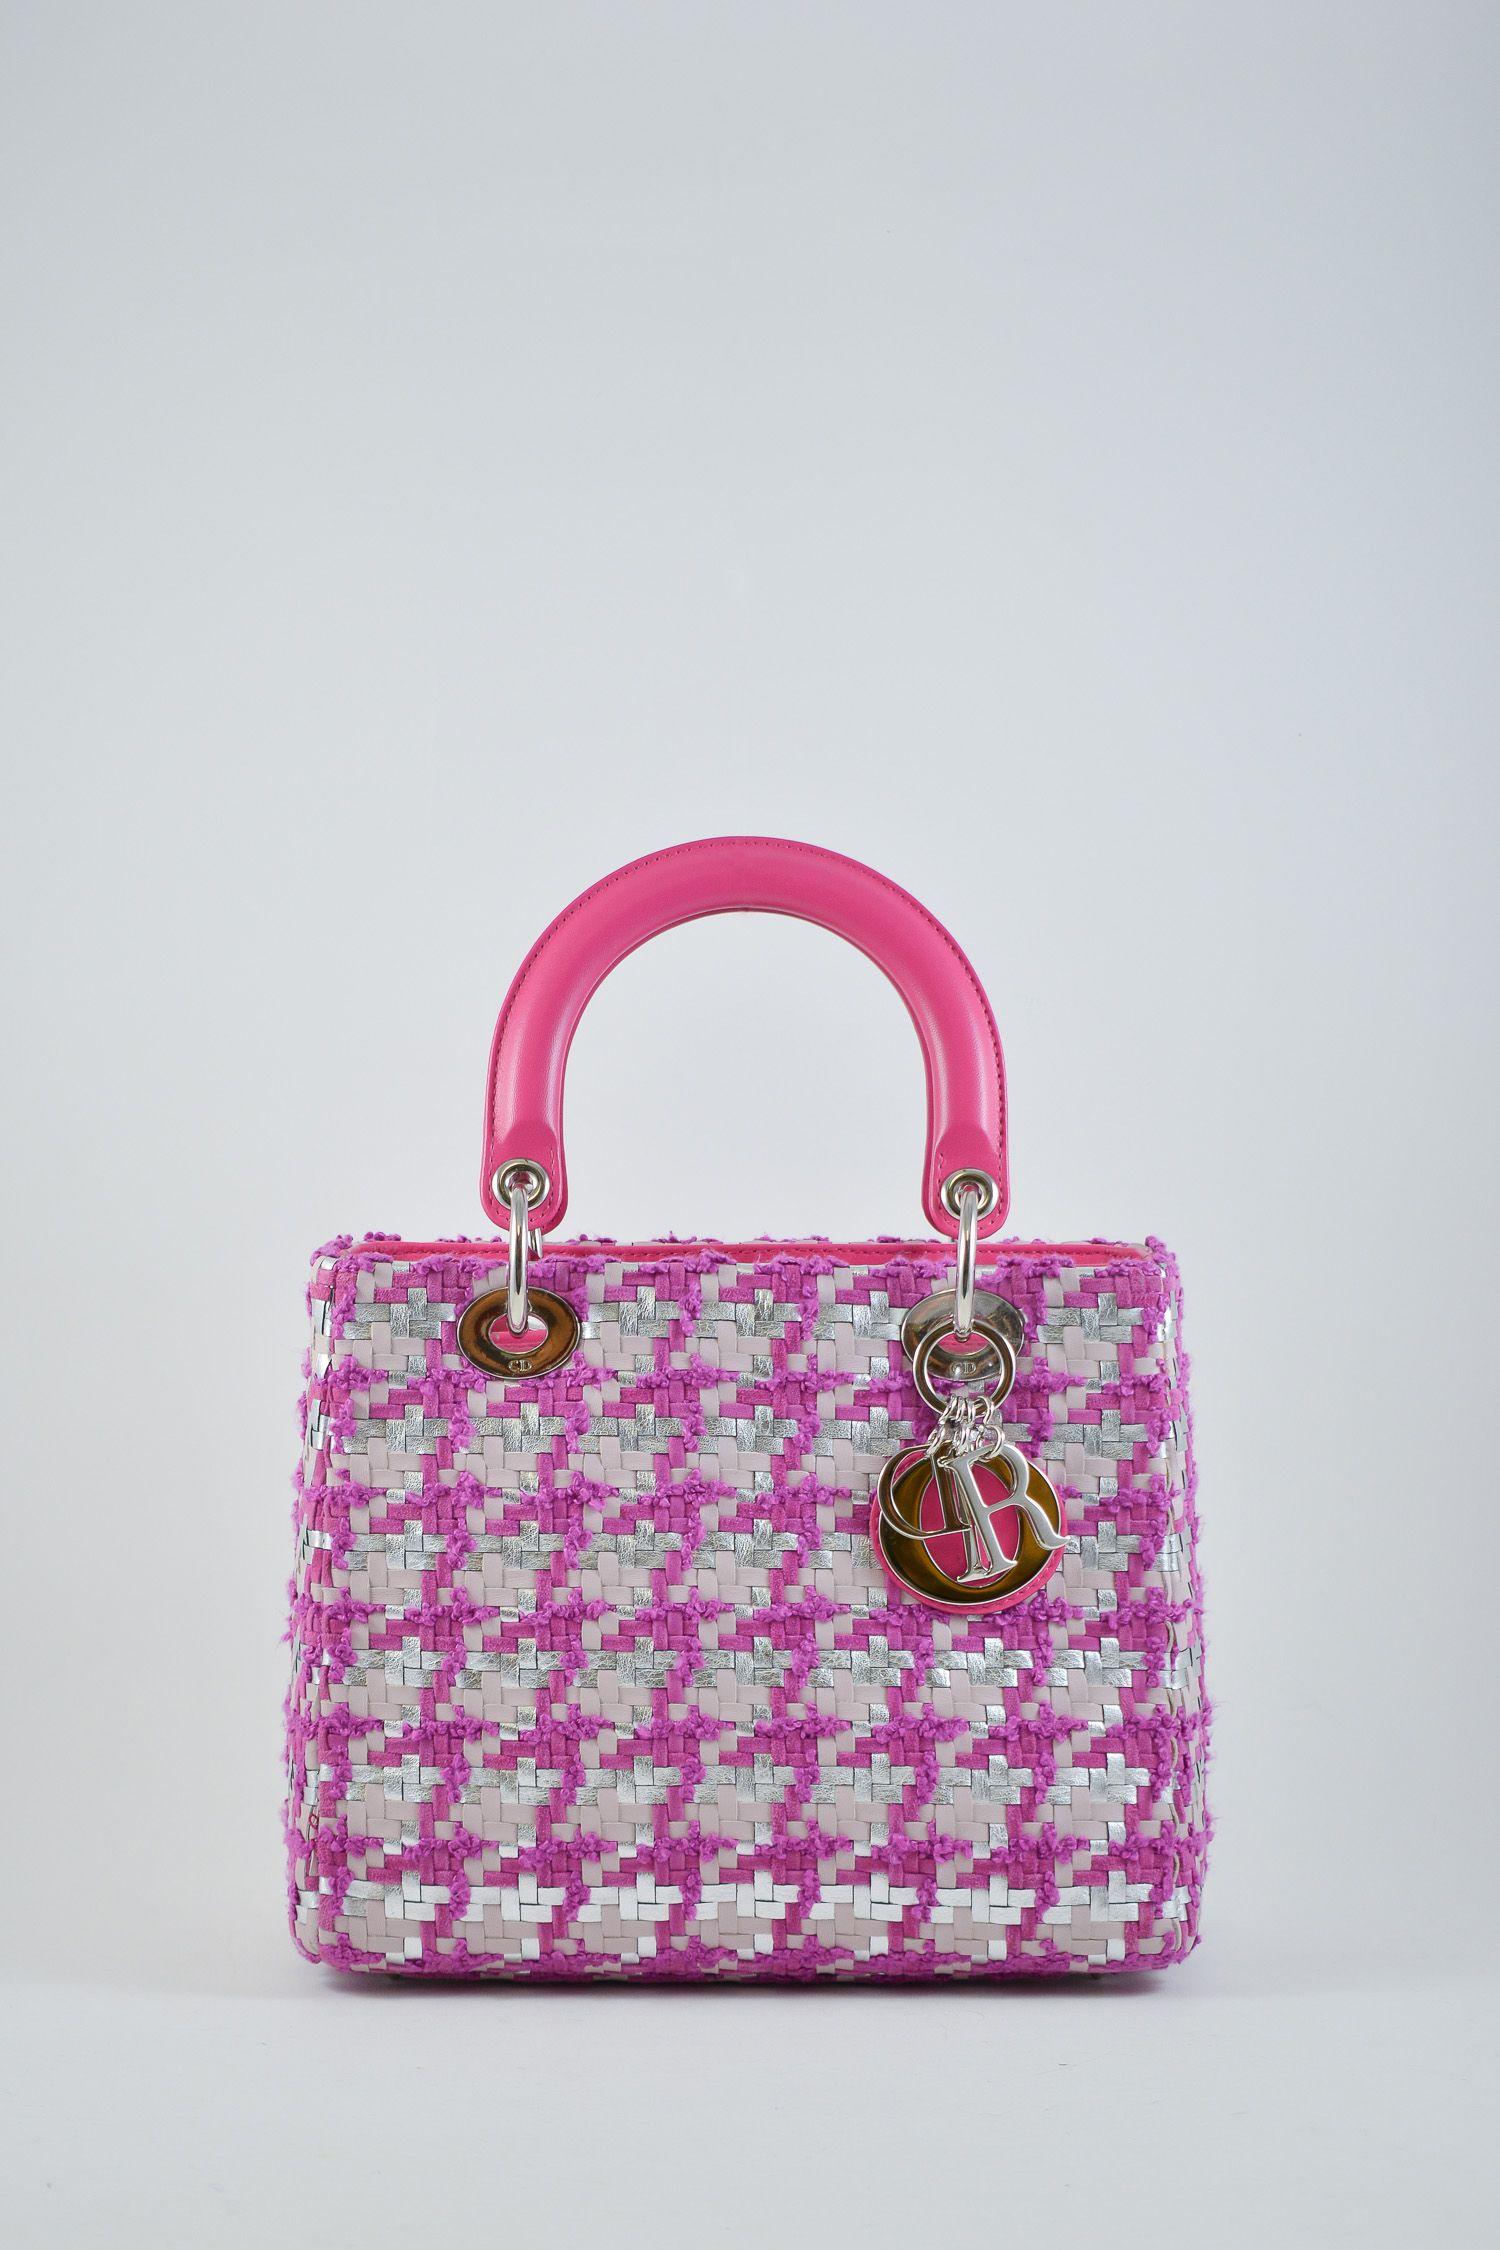 c03fb886d9e Christian Dior pink tweed medium